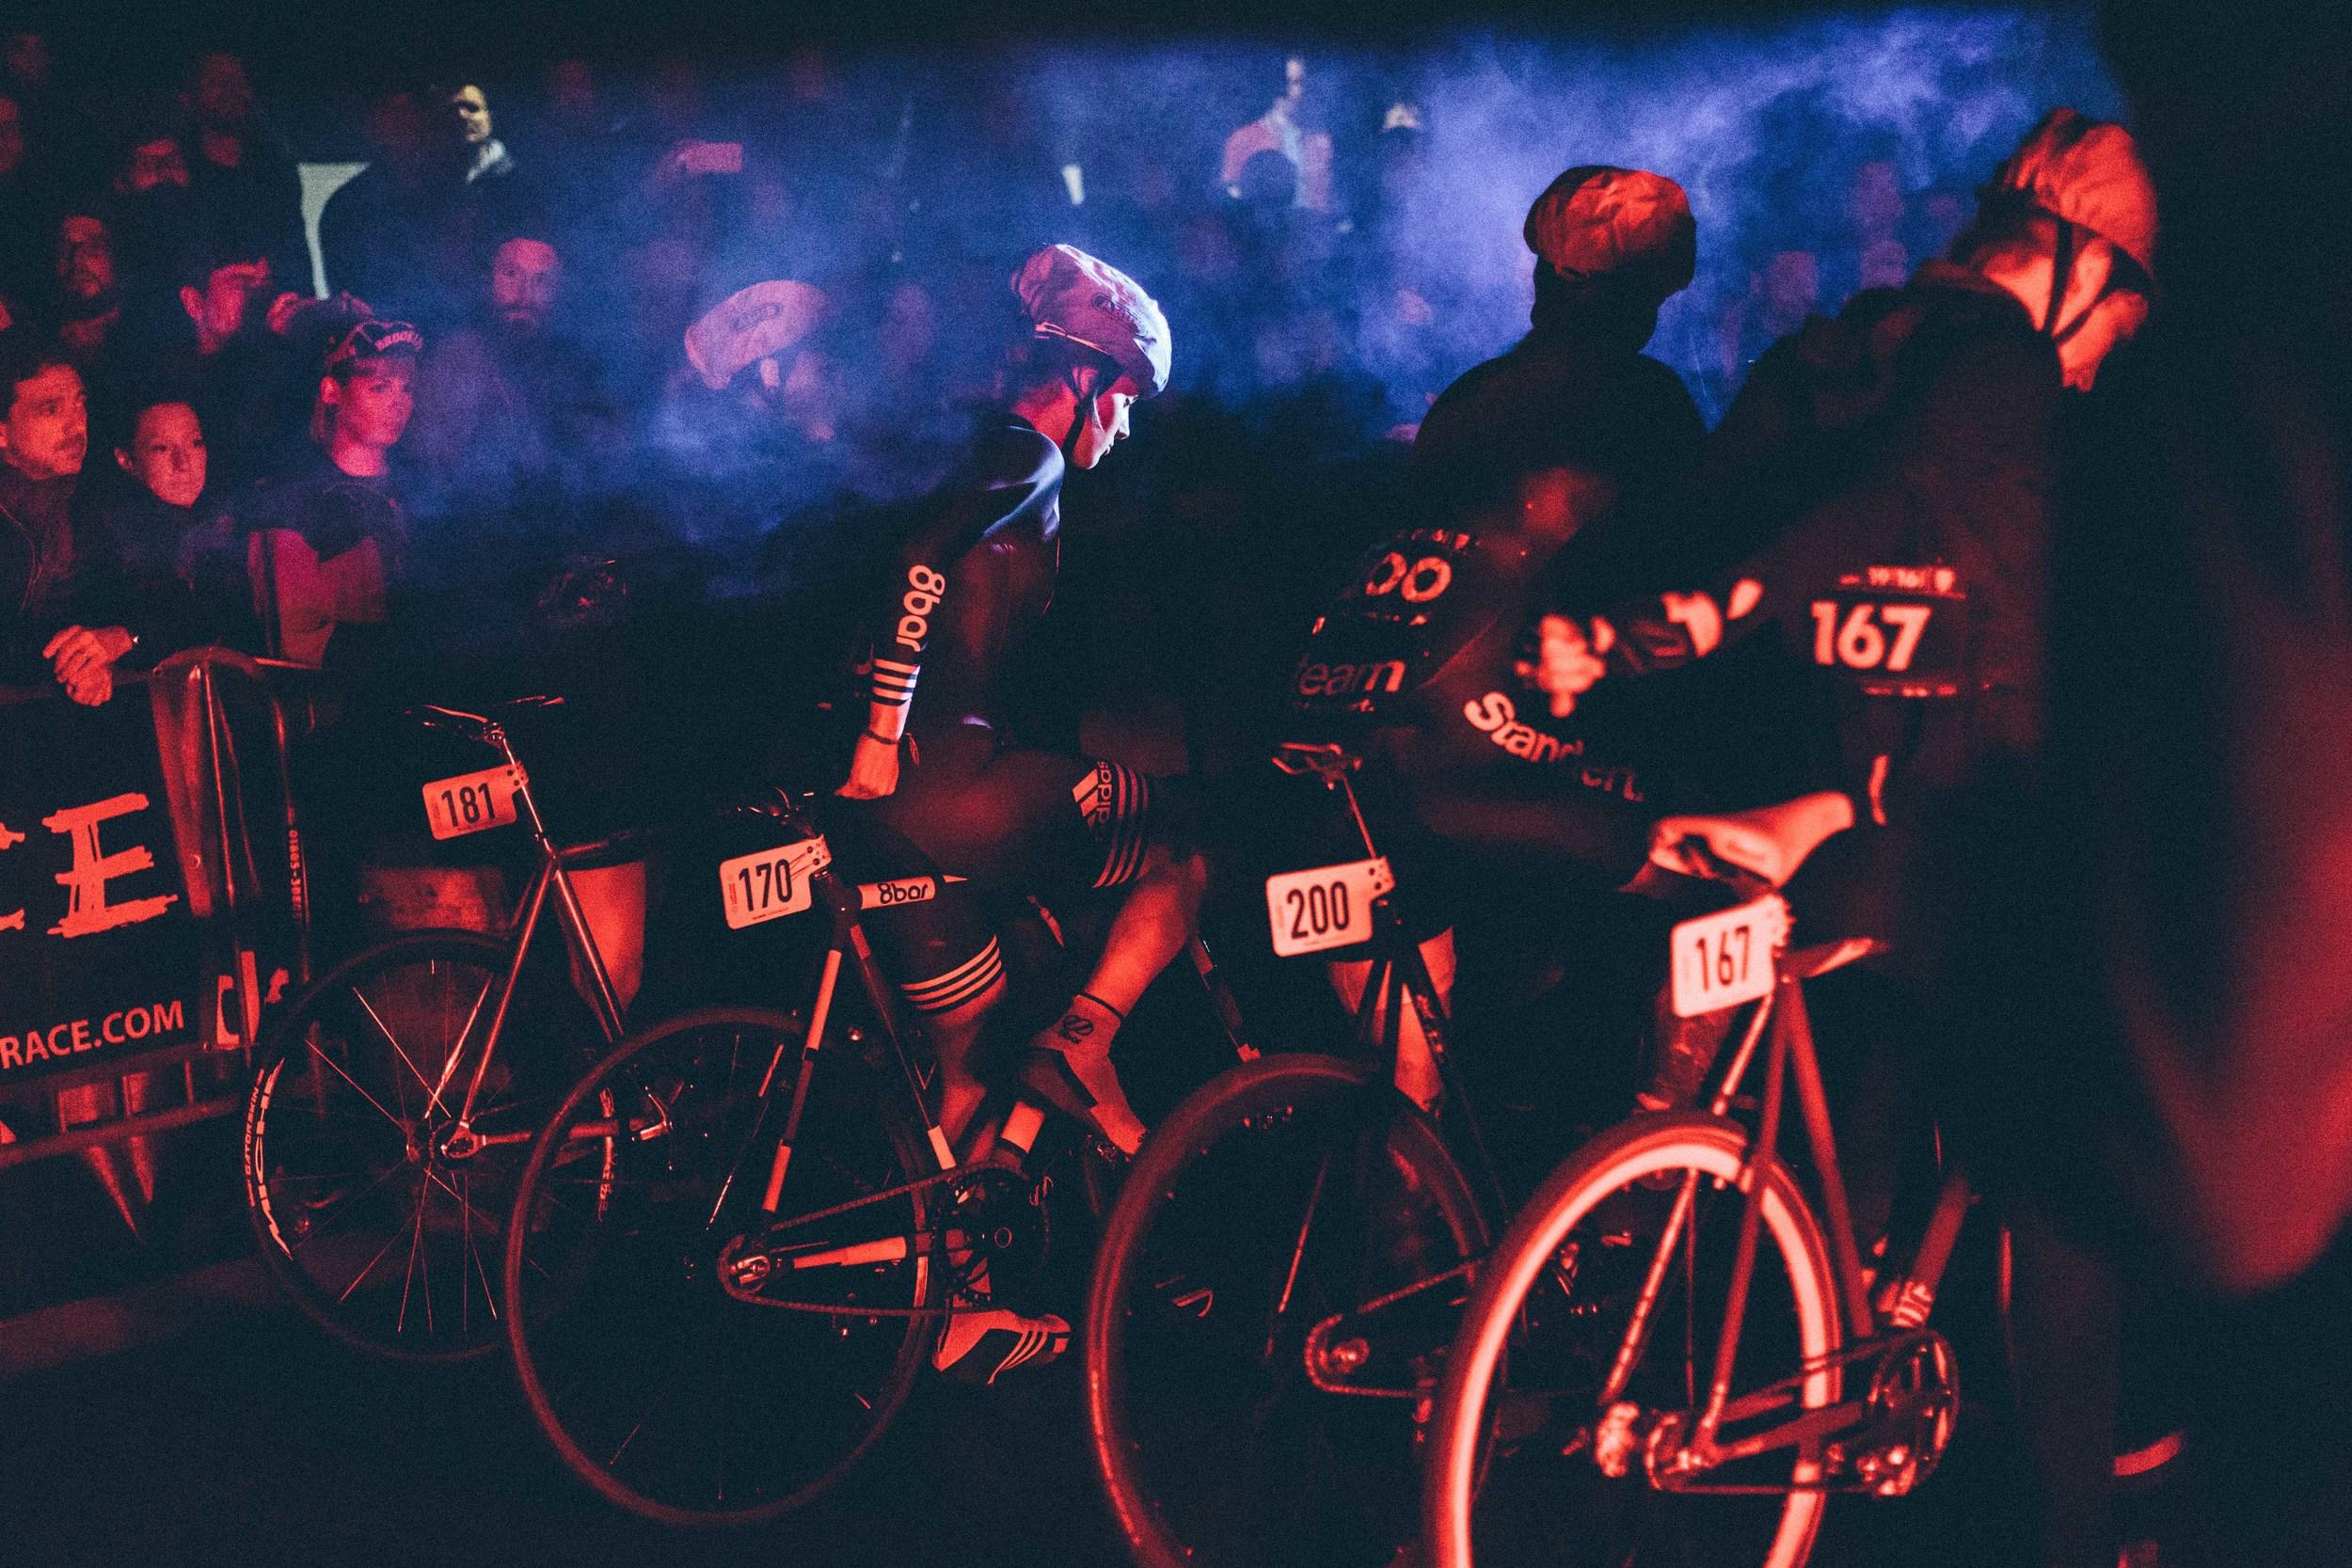 RAD RACE Last Man Standing, Berlin March 19 2016 - Shot by Bengt Stiller 7.jpg